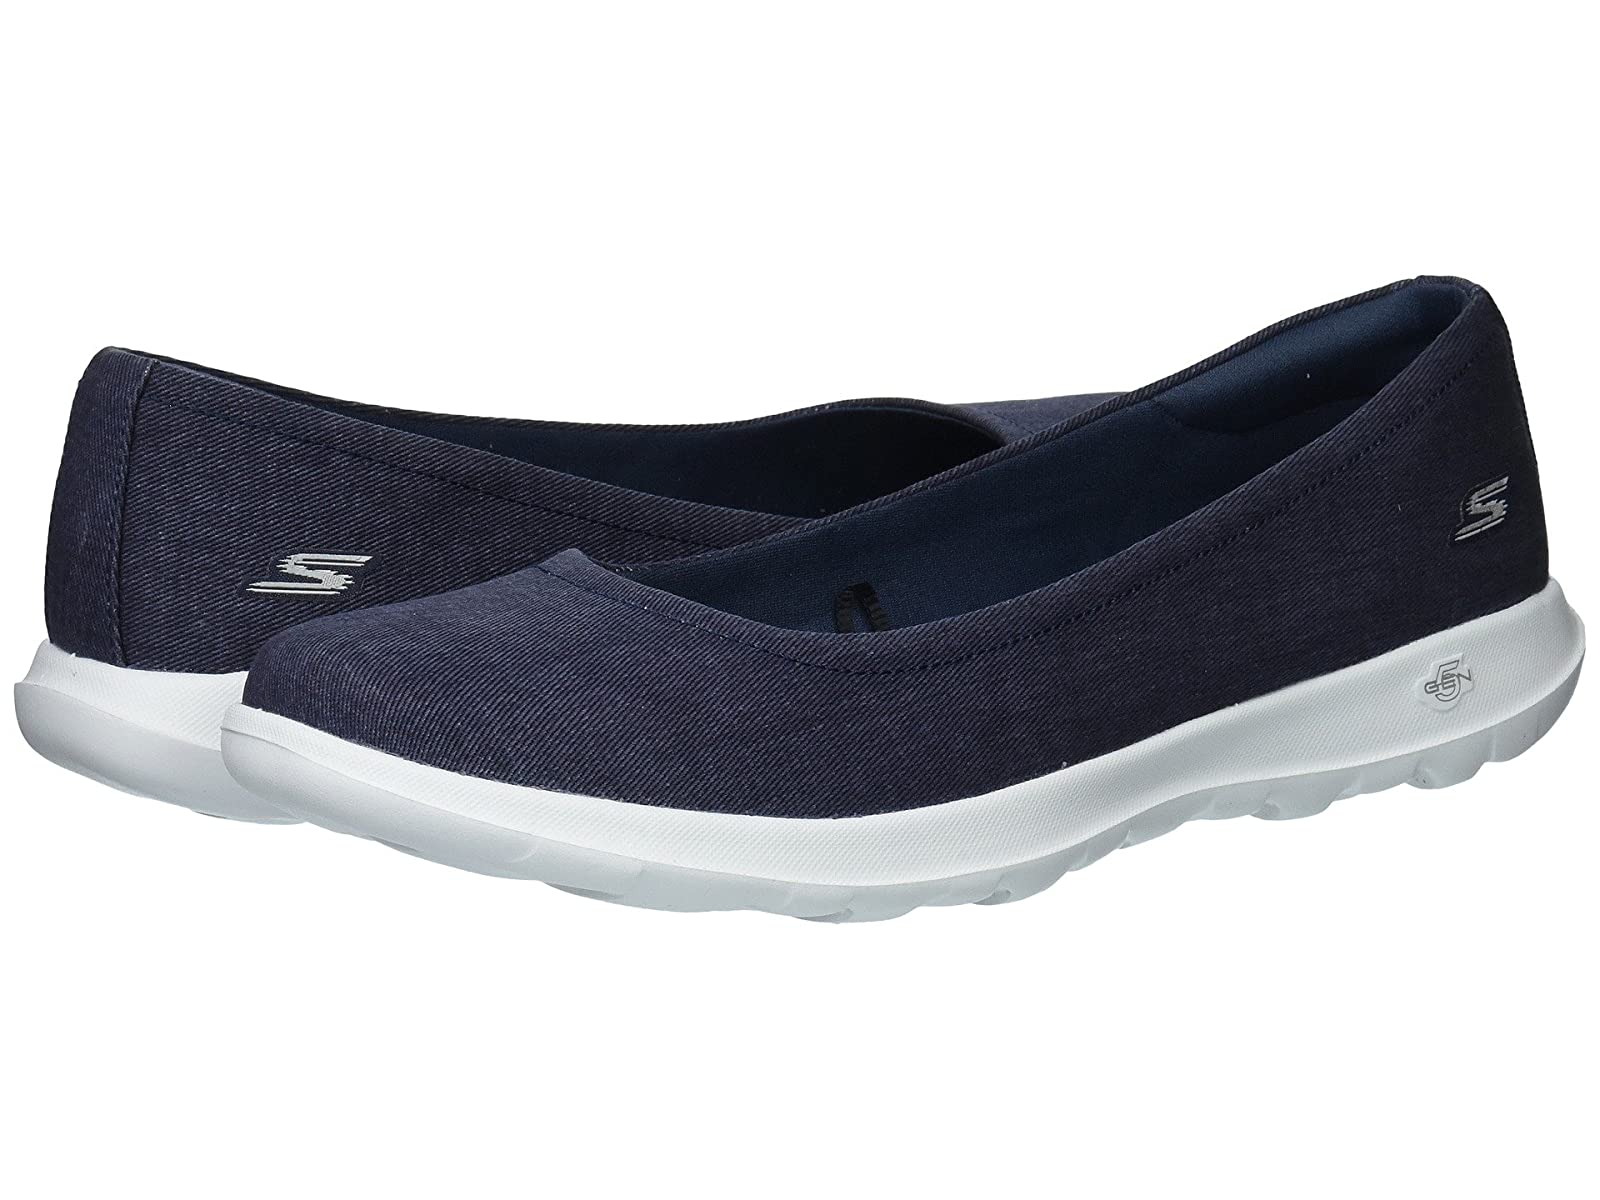 SKECHERS Performance Go Walk Lite - 15393Atmospheric grades have affordable shoes